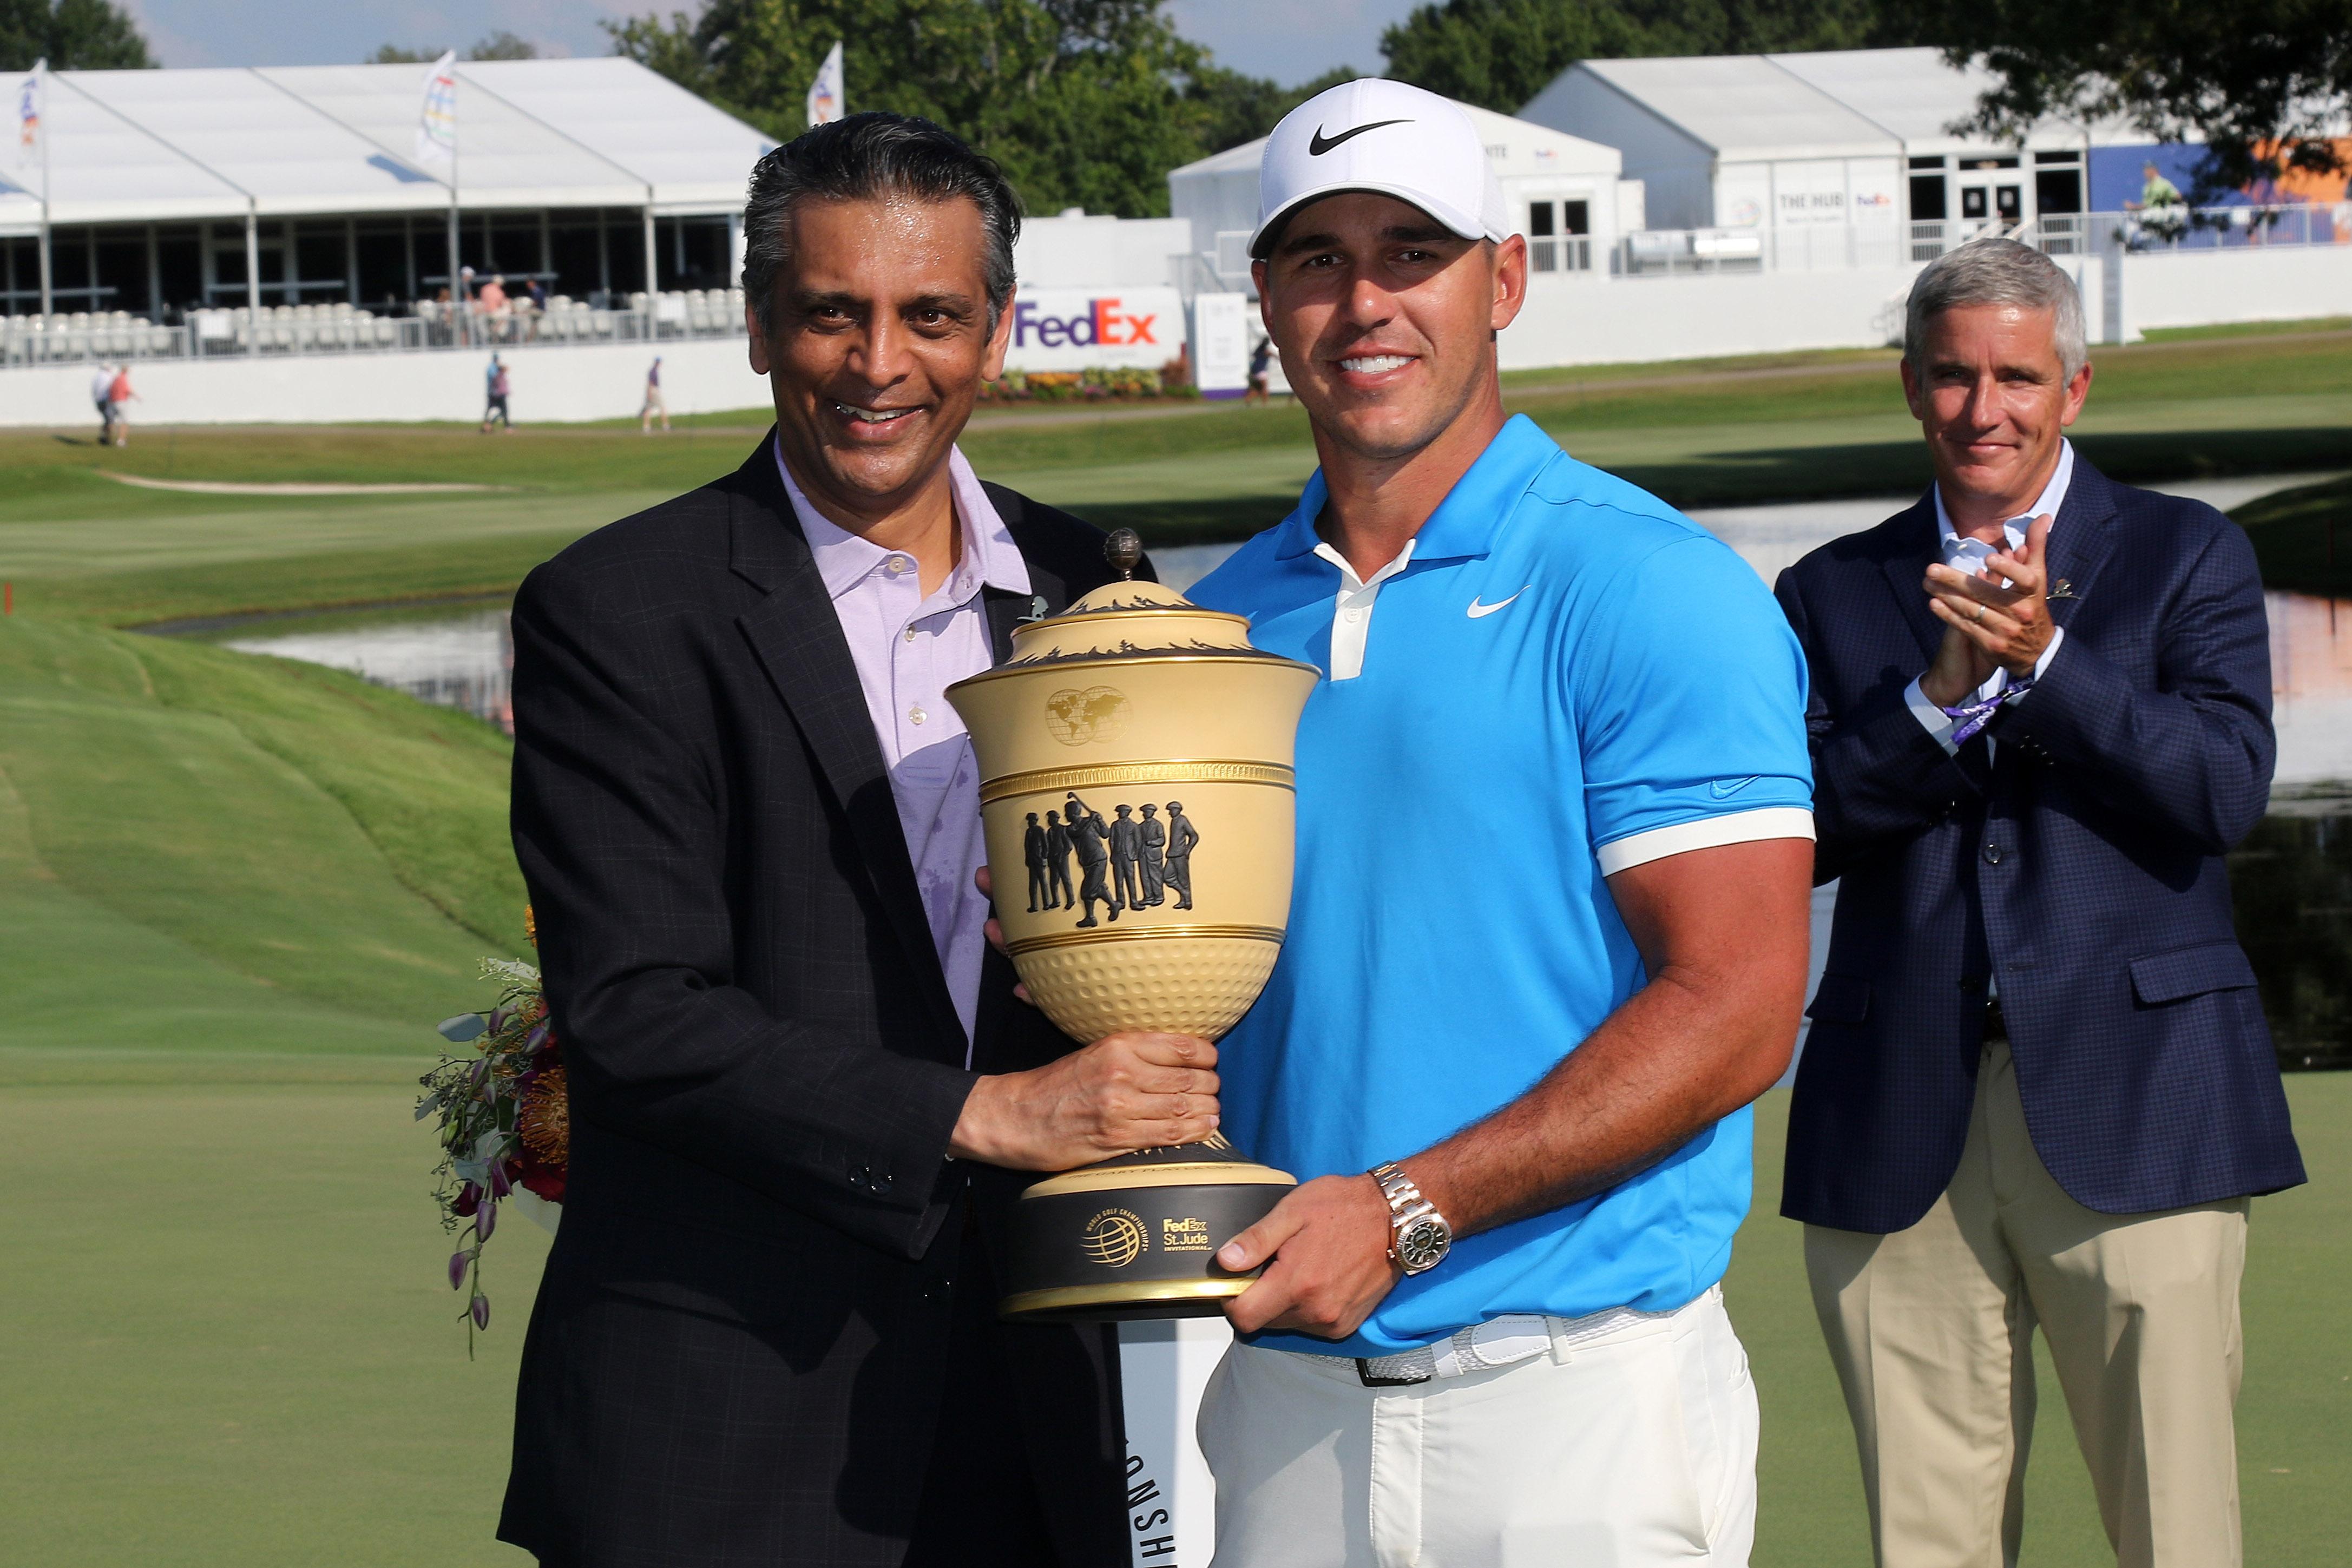 GOLF: JUL 28 PGA - World Golf Championships-FedEx St Jude Invitational